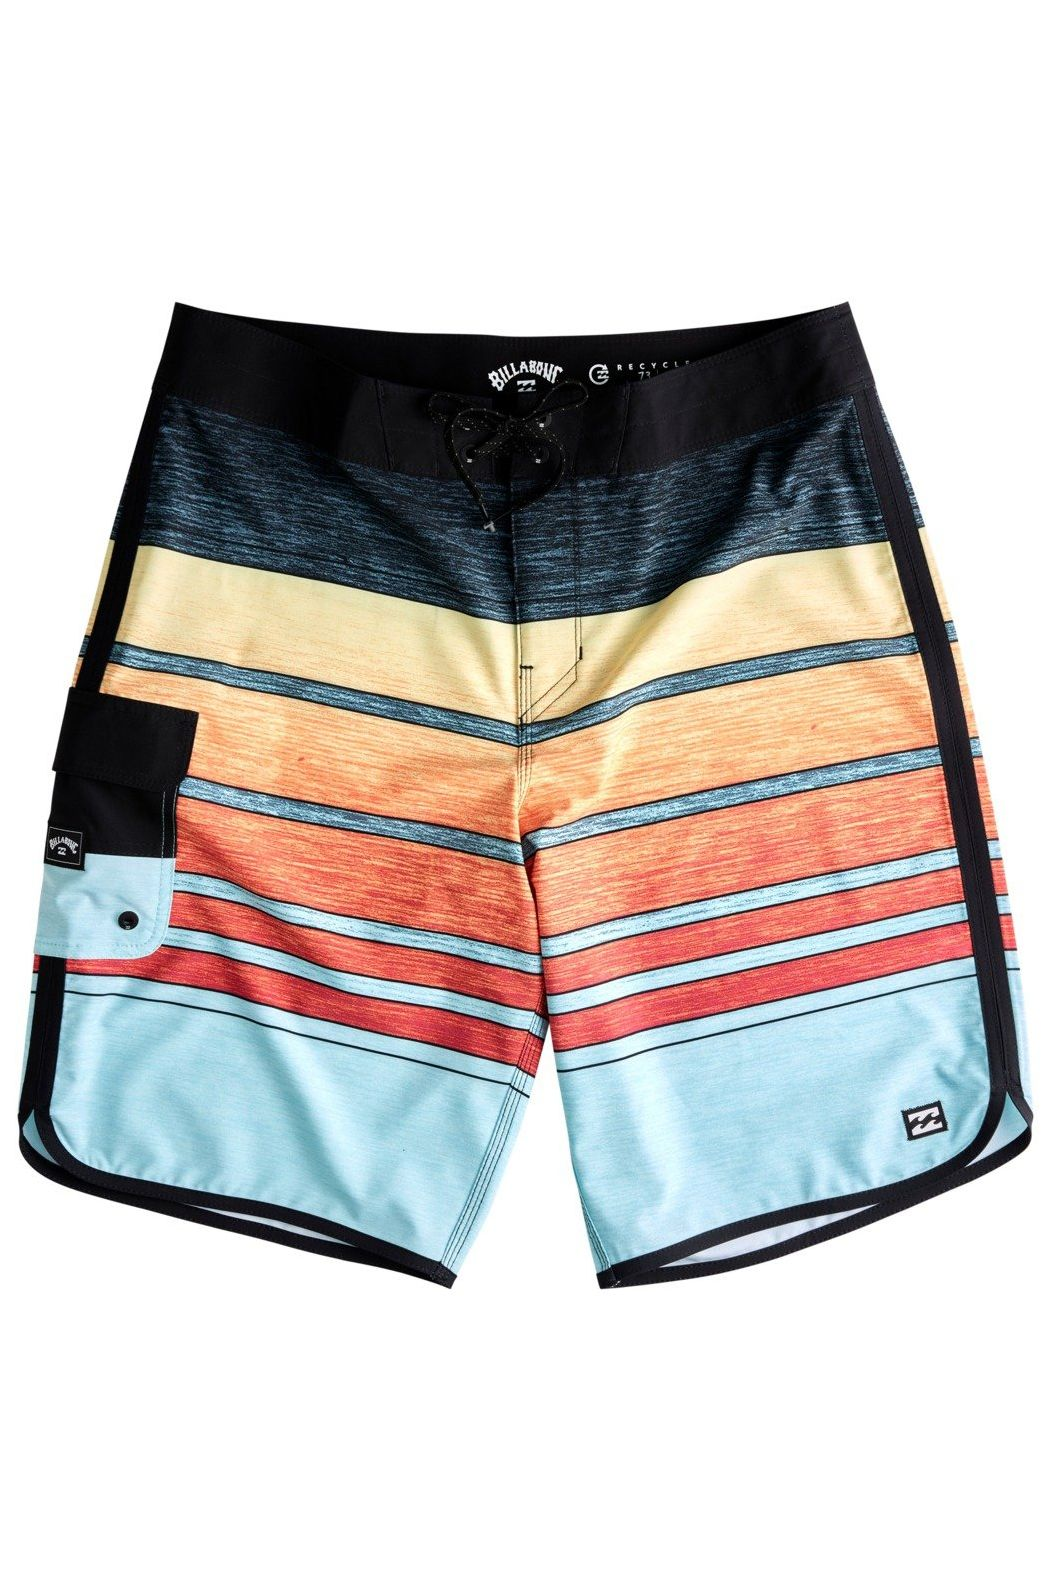 Billabong Boardshorts 73 STRIPE PRO BOY Neon